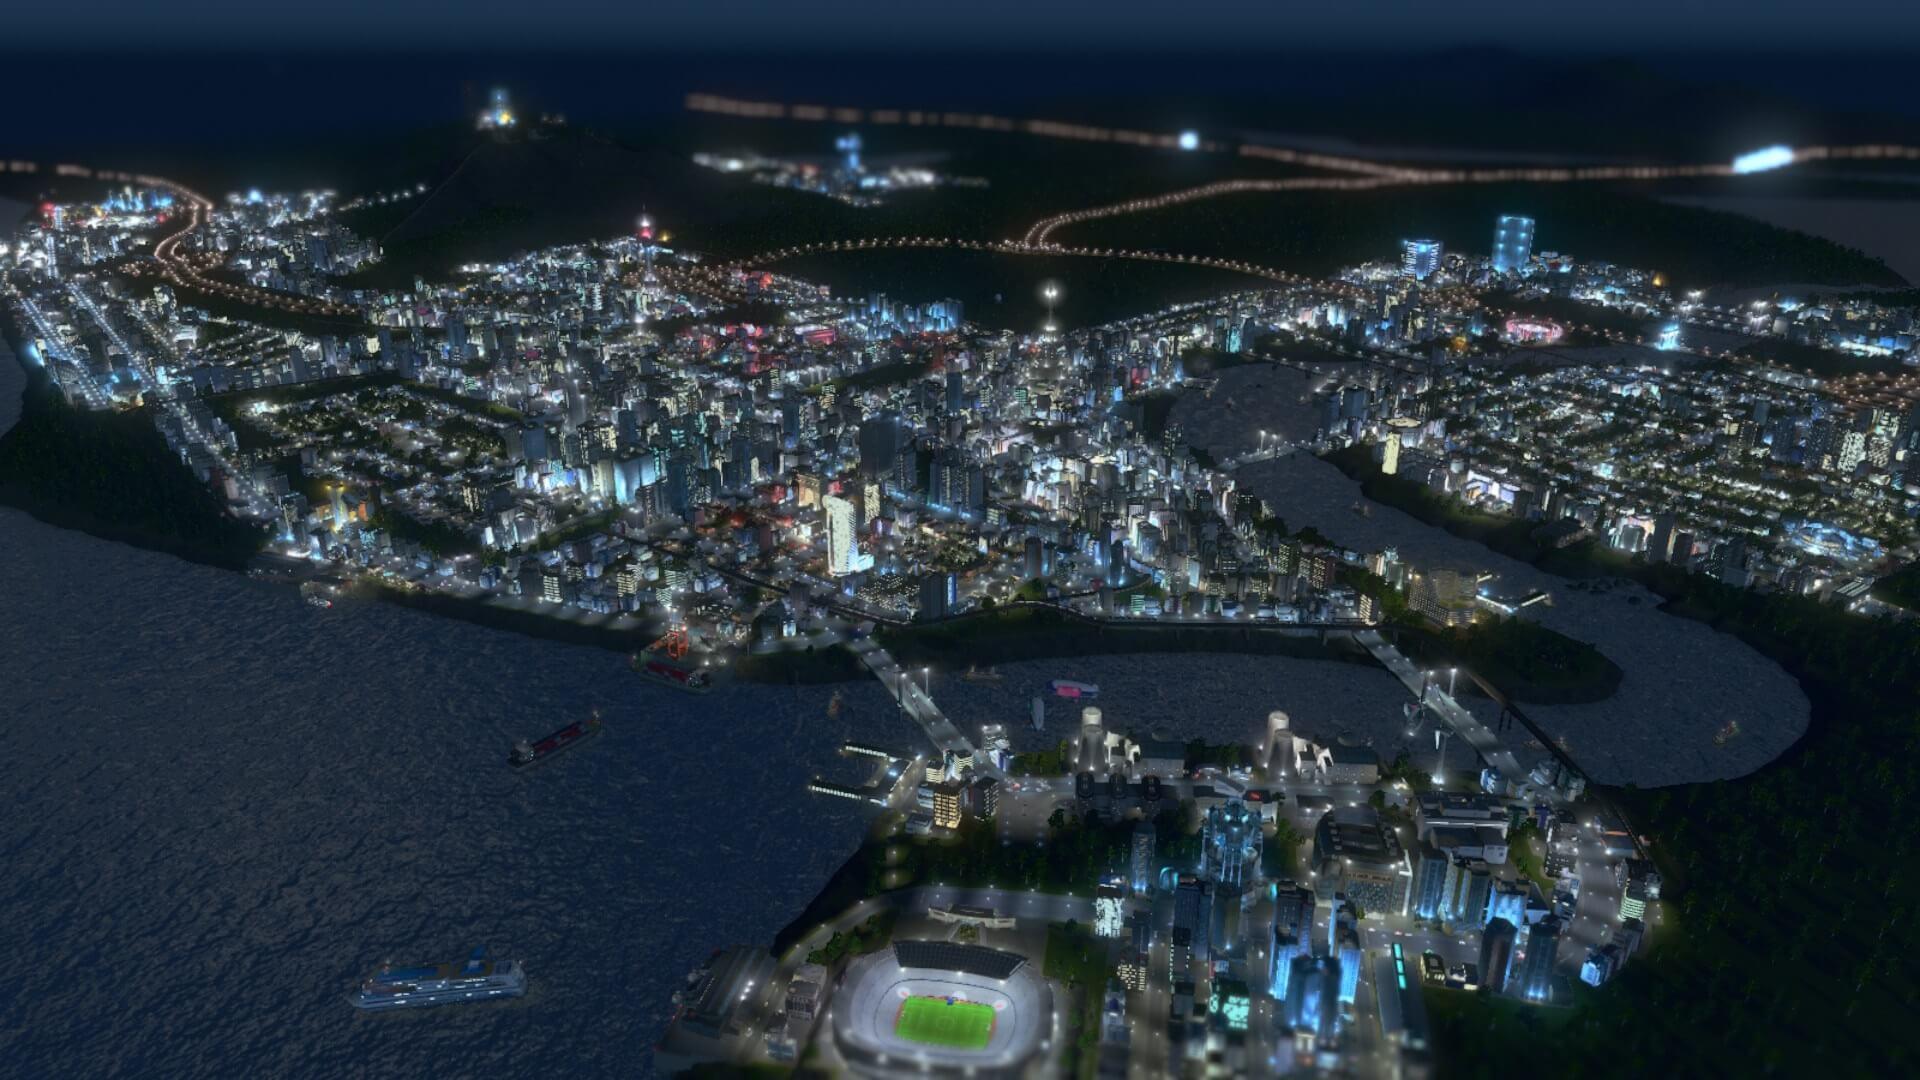 office001 【シティーズ スカイライン 攻略ブログ】 特化地区とオフィス区画で高収益を目指す Cities:Skylines(シティーズ:スカイライン ) 街作りシミュレーションゲーム